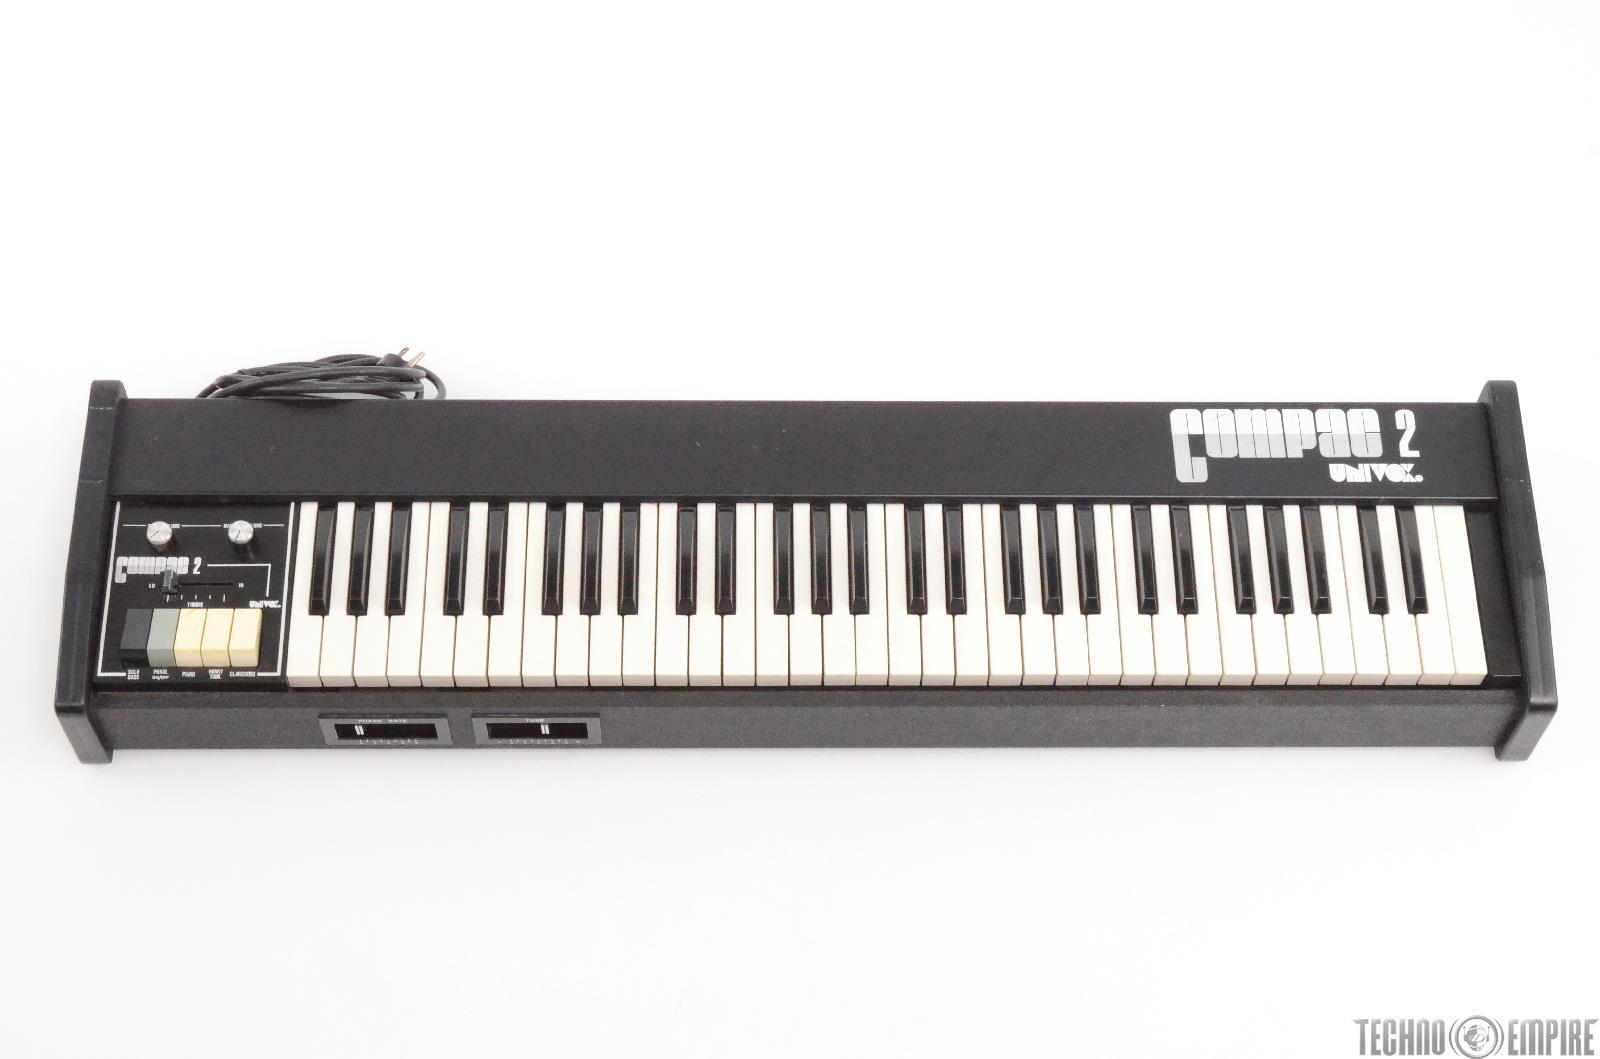 Univox Compac 2 Electric Piano Keyboard Synthesizer #29817